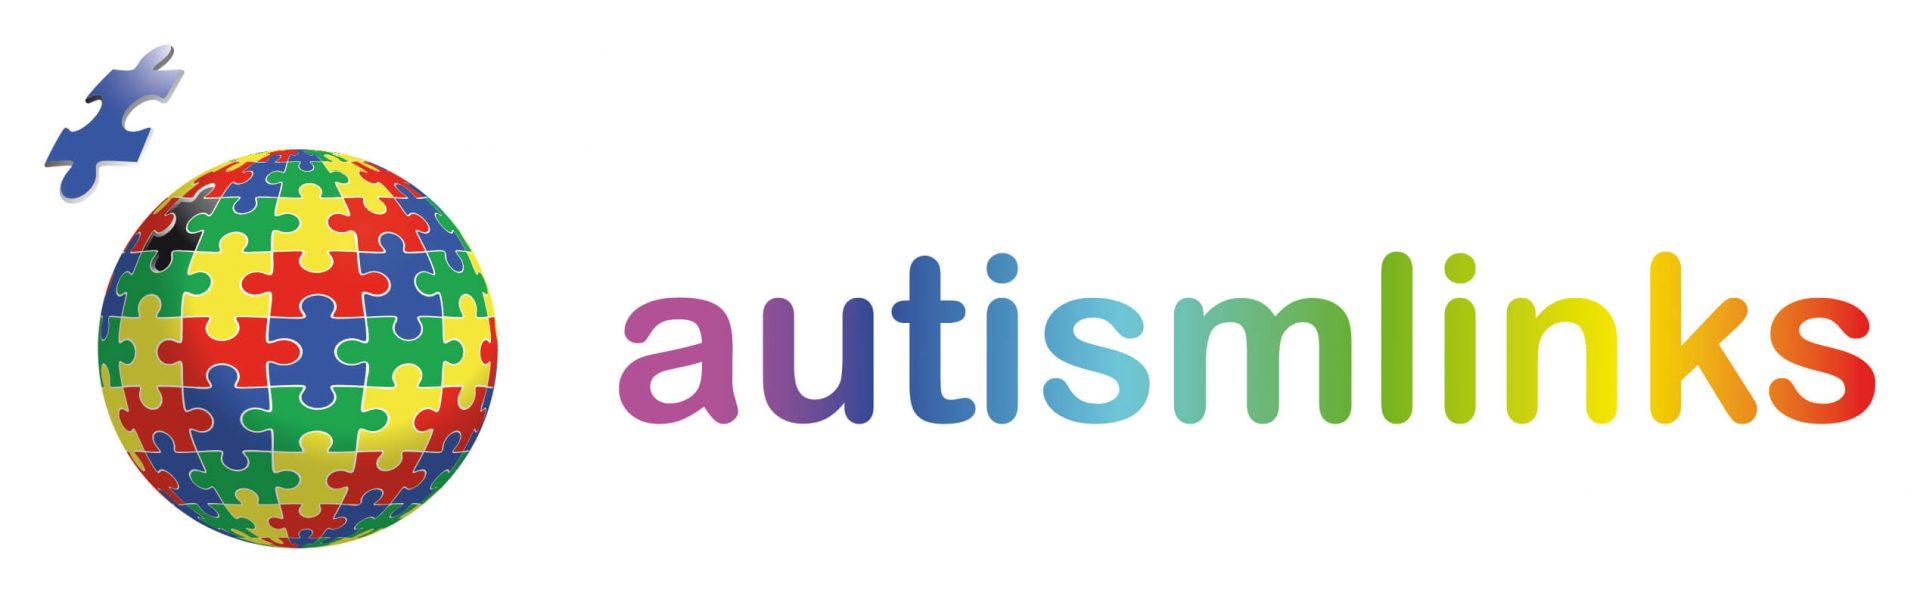 Autismlinks